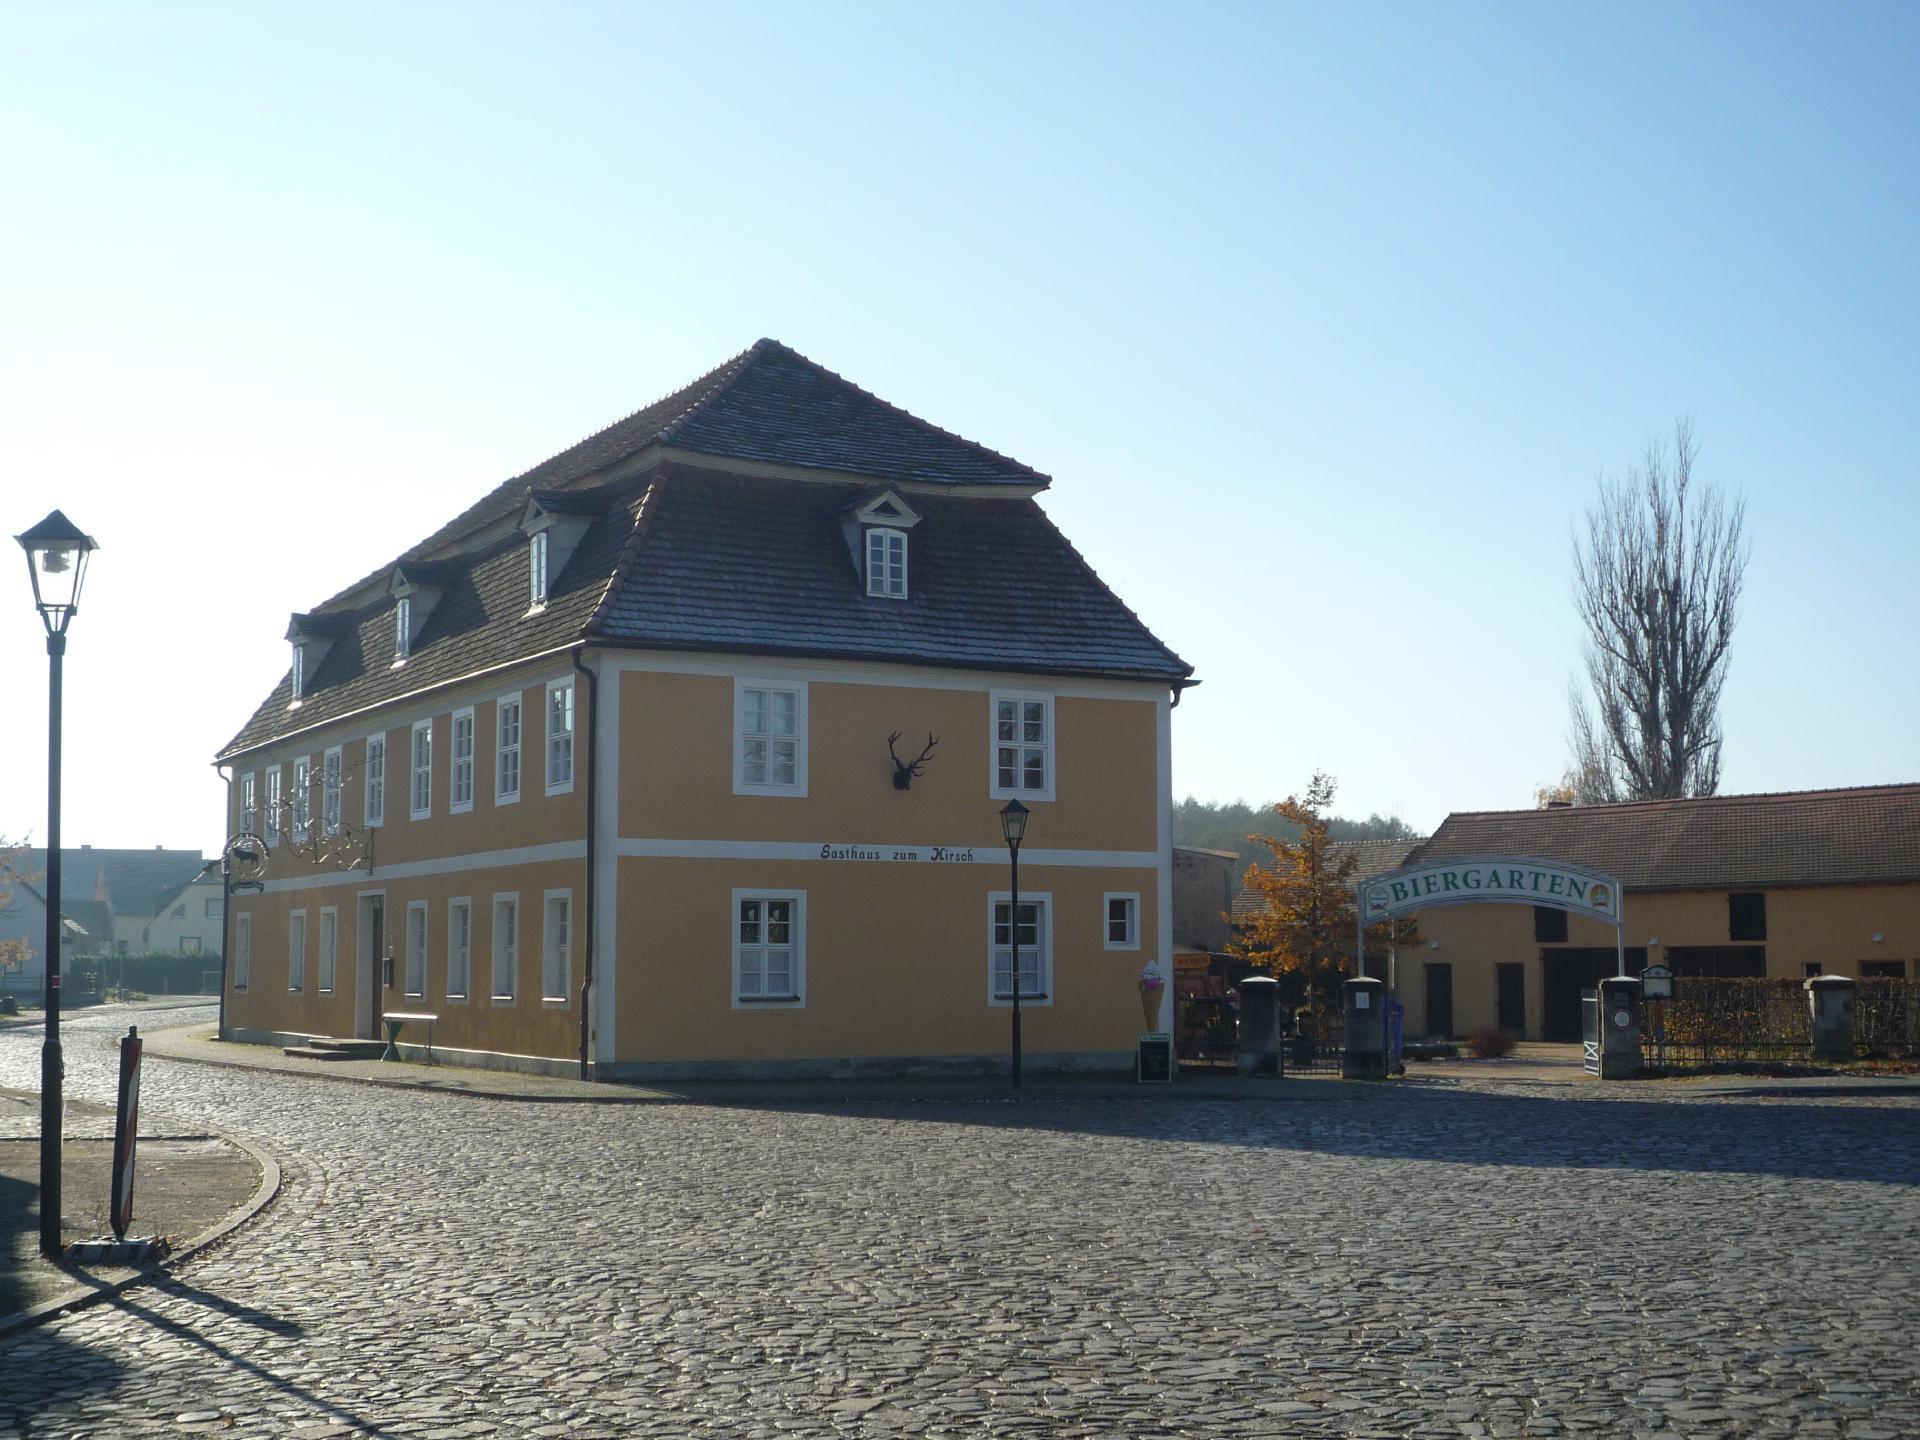 LDS-FuerstlDrehna-Gasths-SG-2016.jpg